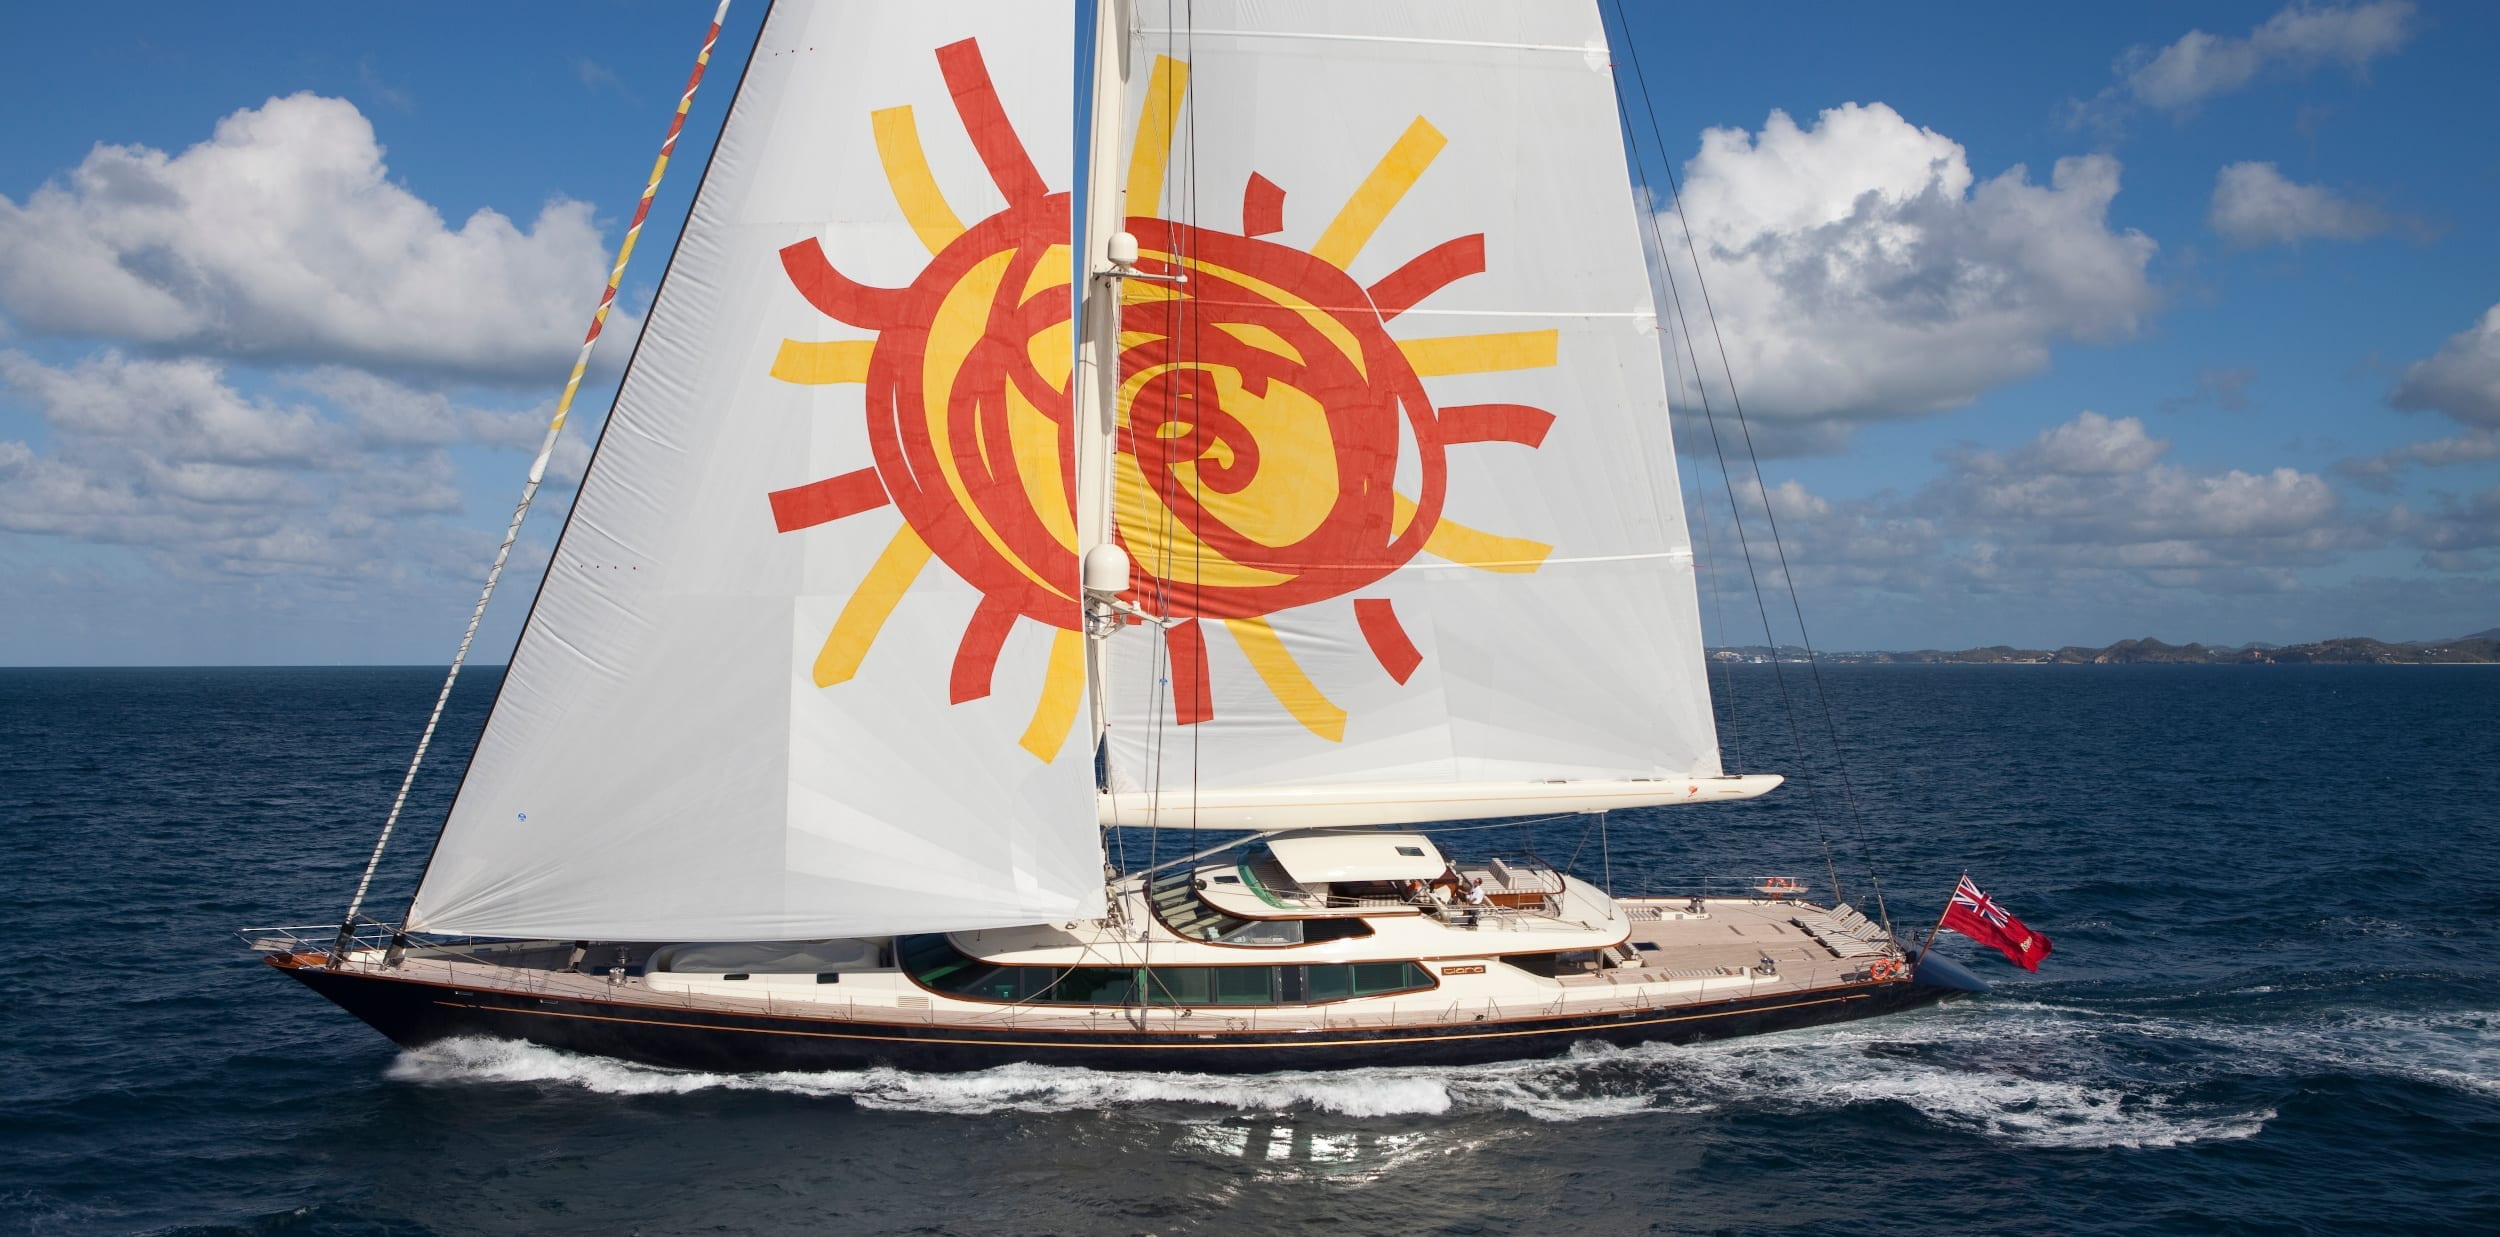 Tiara Yacht Profile Sailing